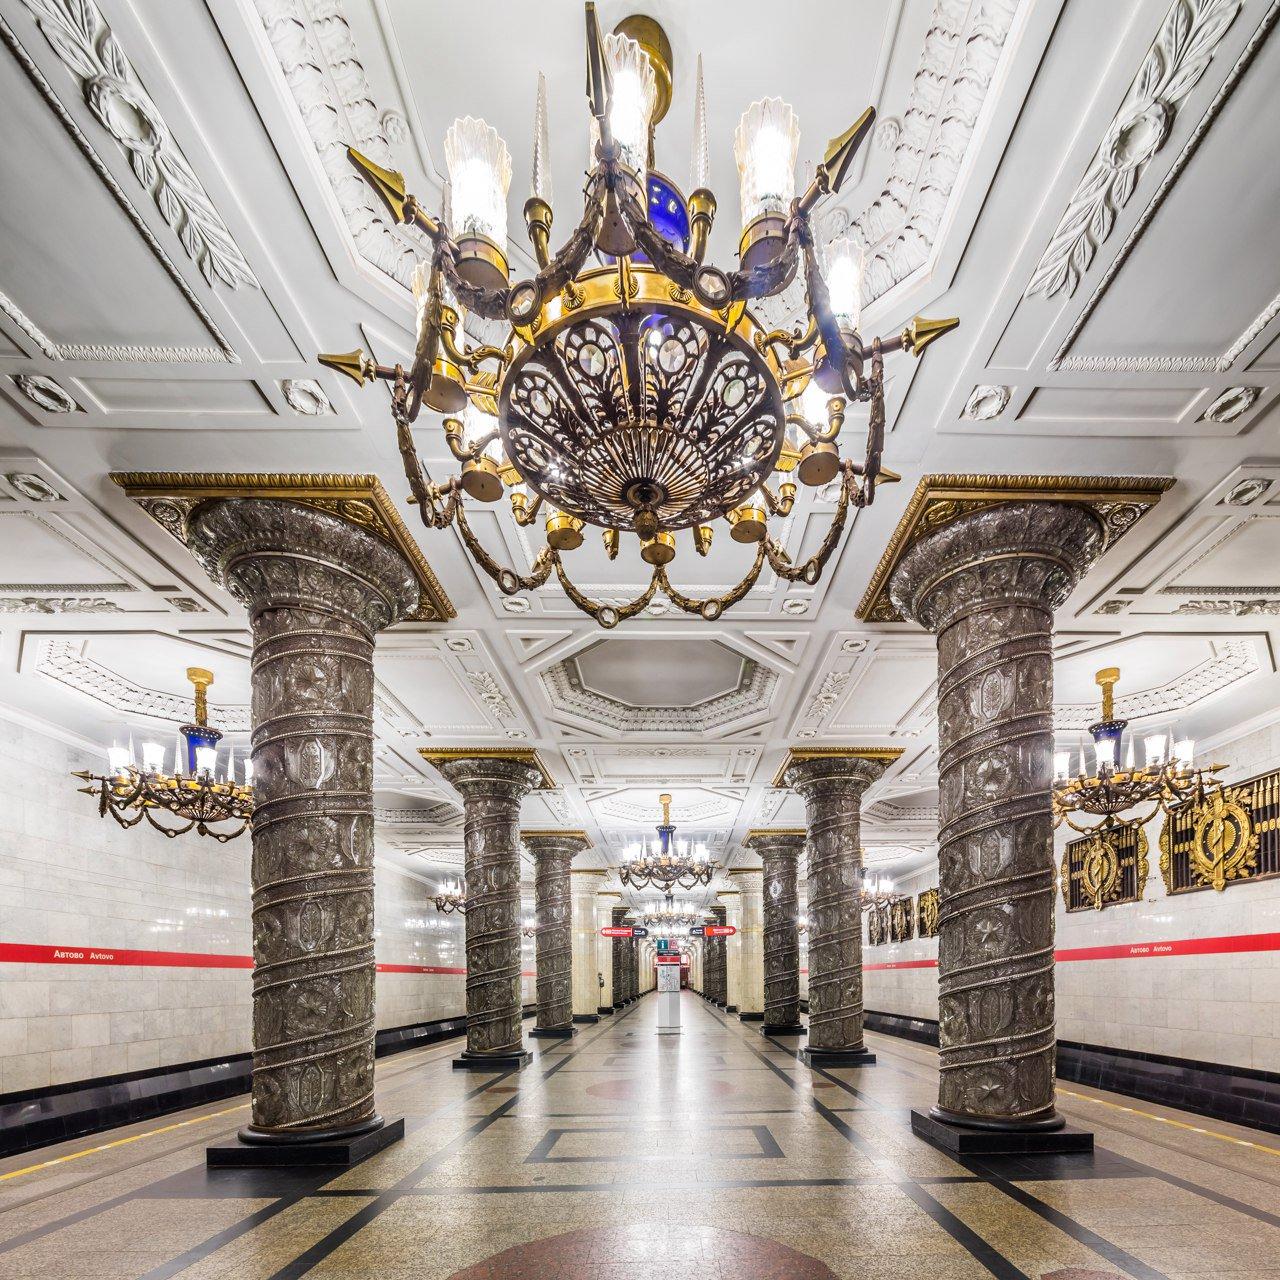 «Автово» — станция Петербургского метрополитена